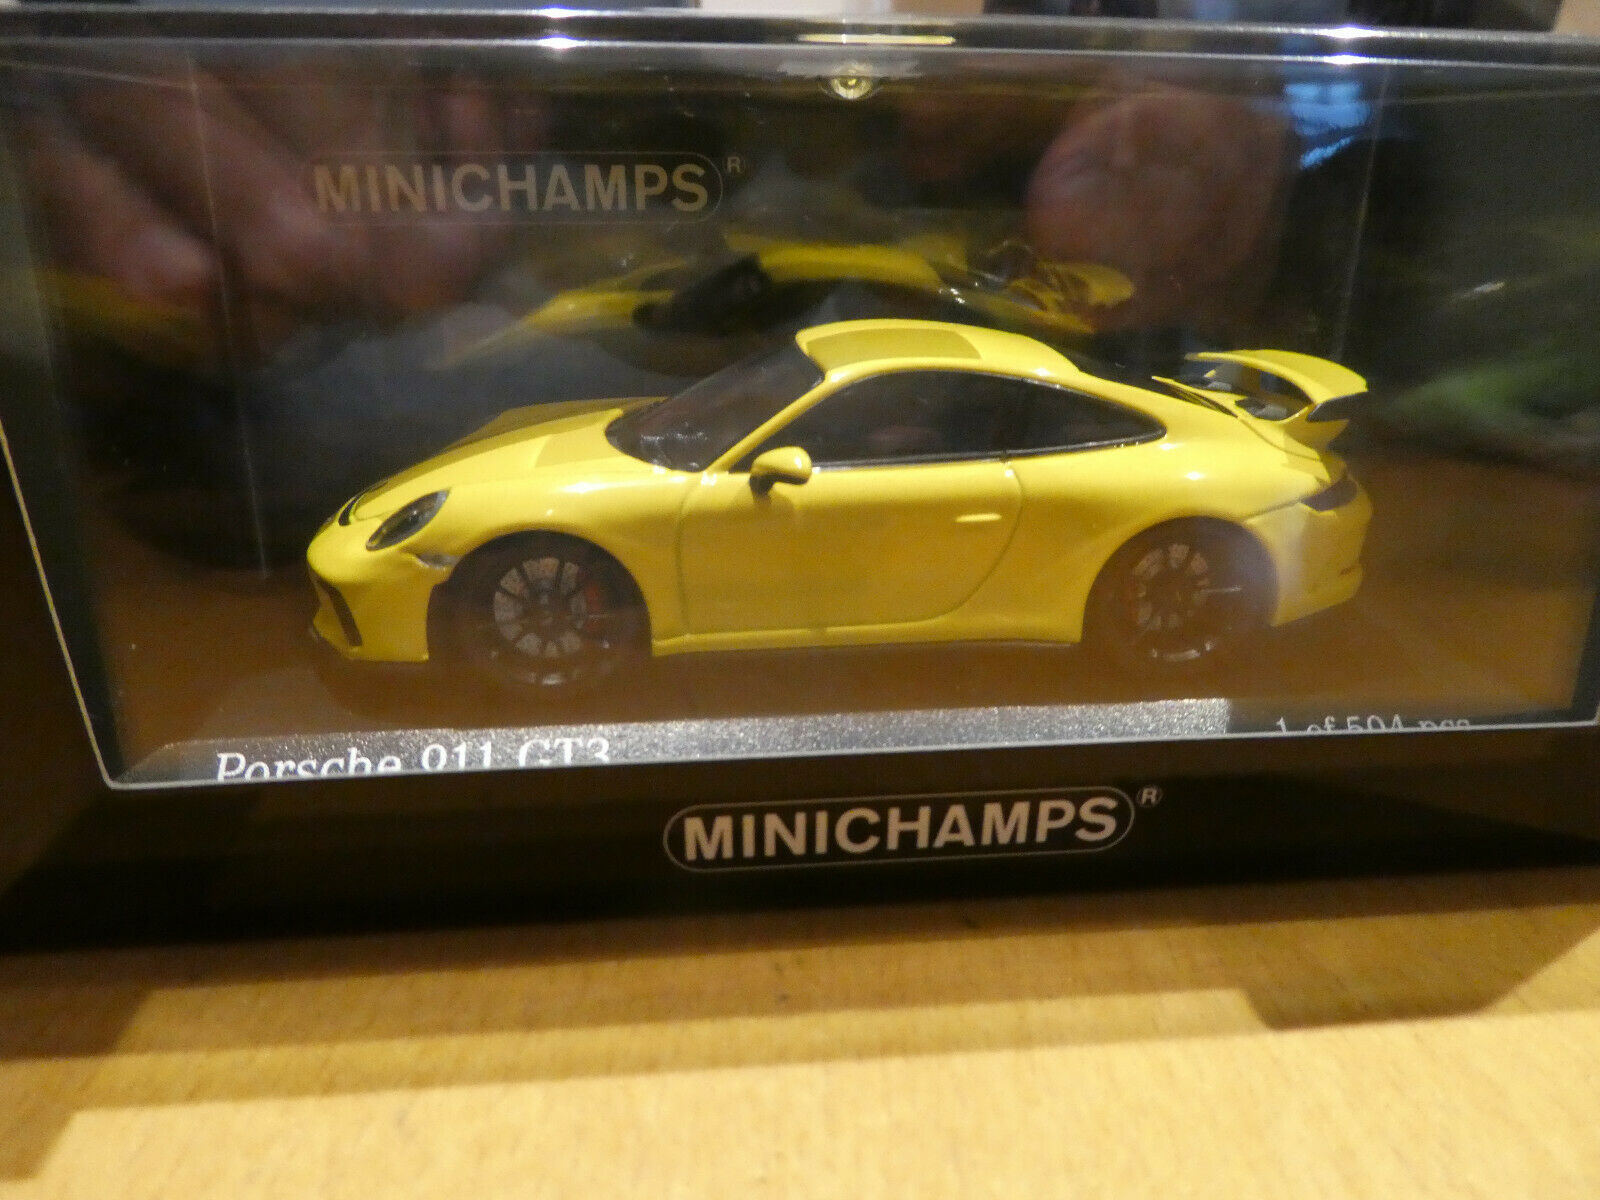 Porsche 911 gt3 2016 racingamarillo amarillo amarillo 1 43 Minichamps 410066020